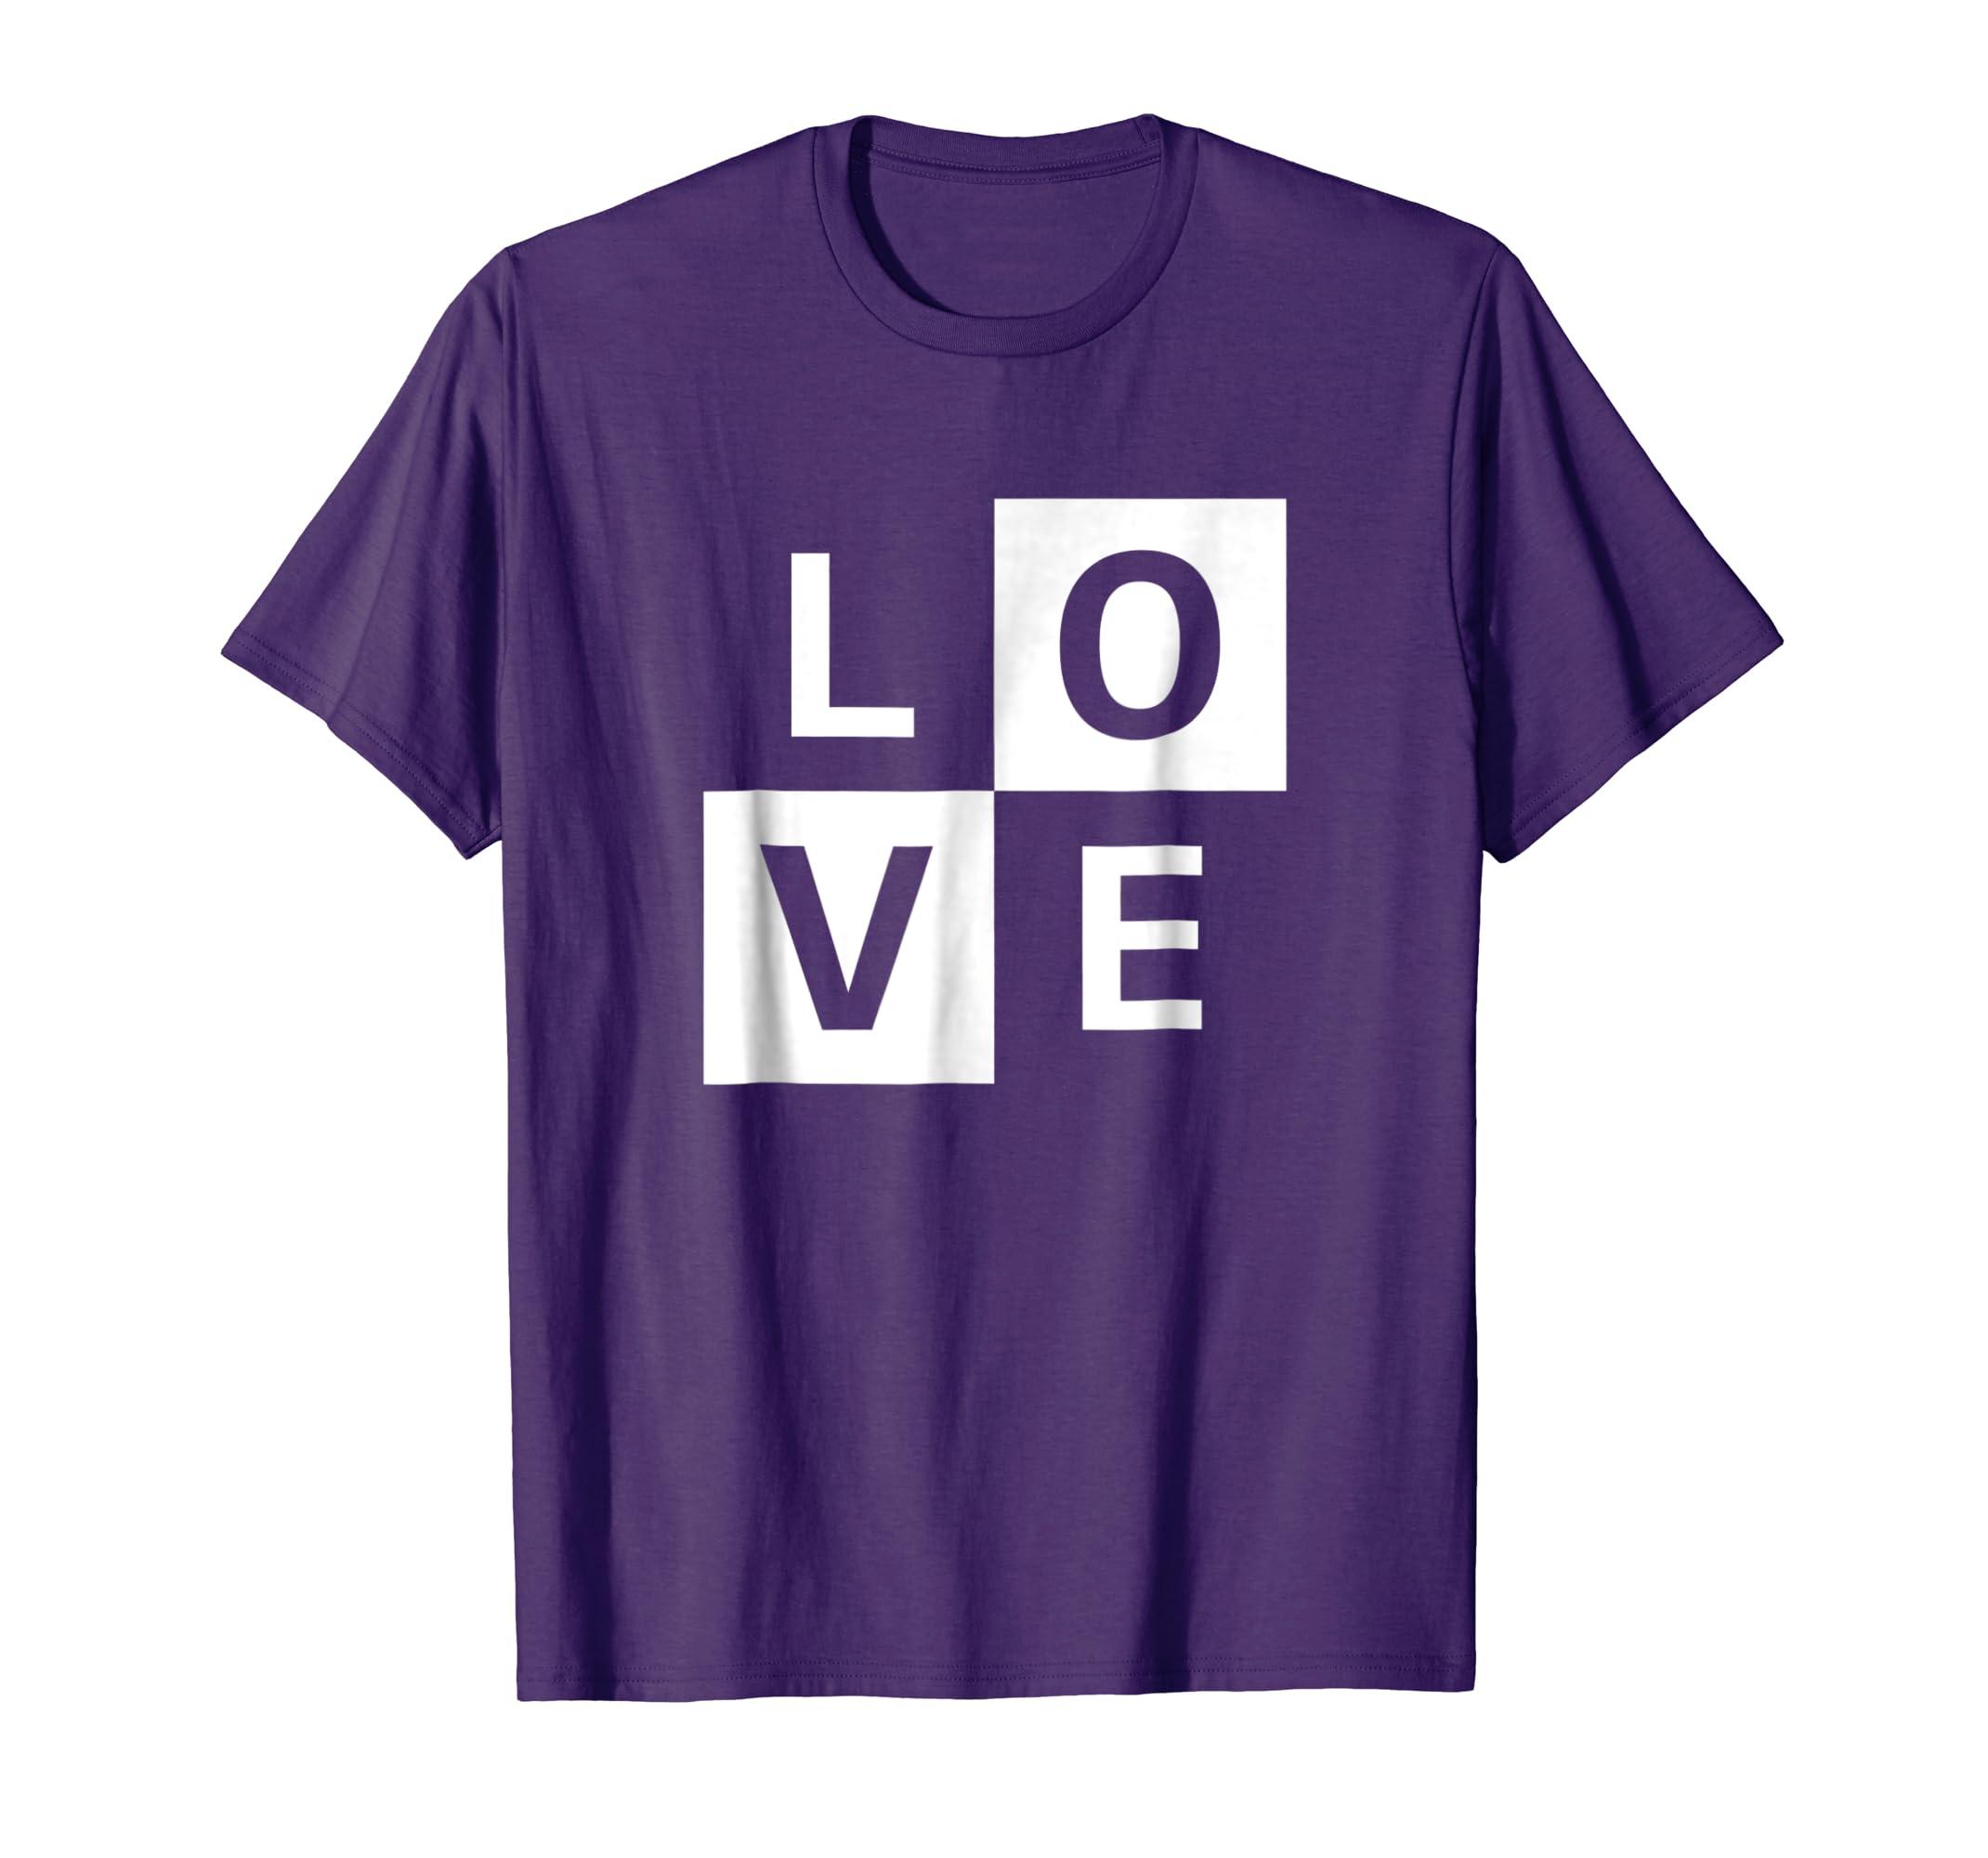 Love T-shirt Simple Design for Men and Women- TPT